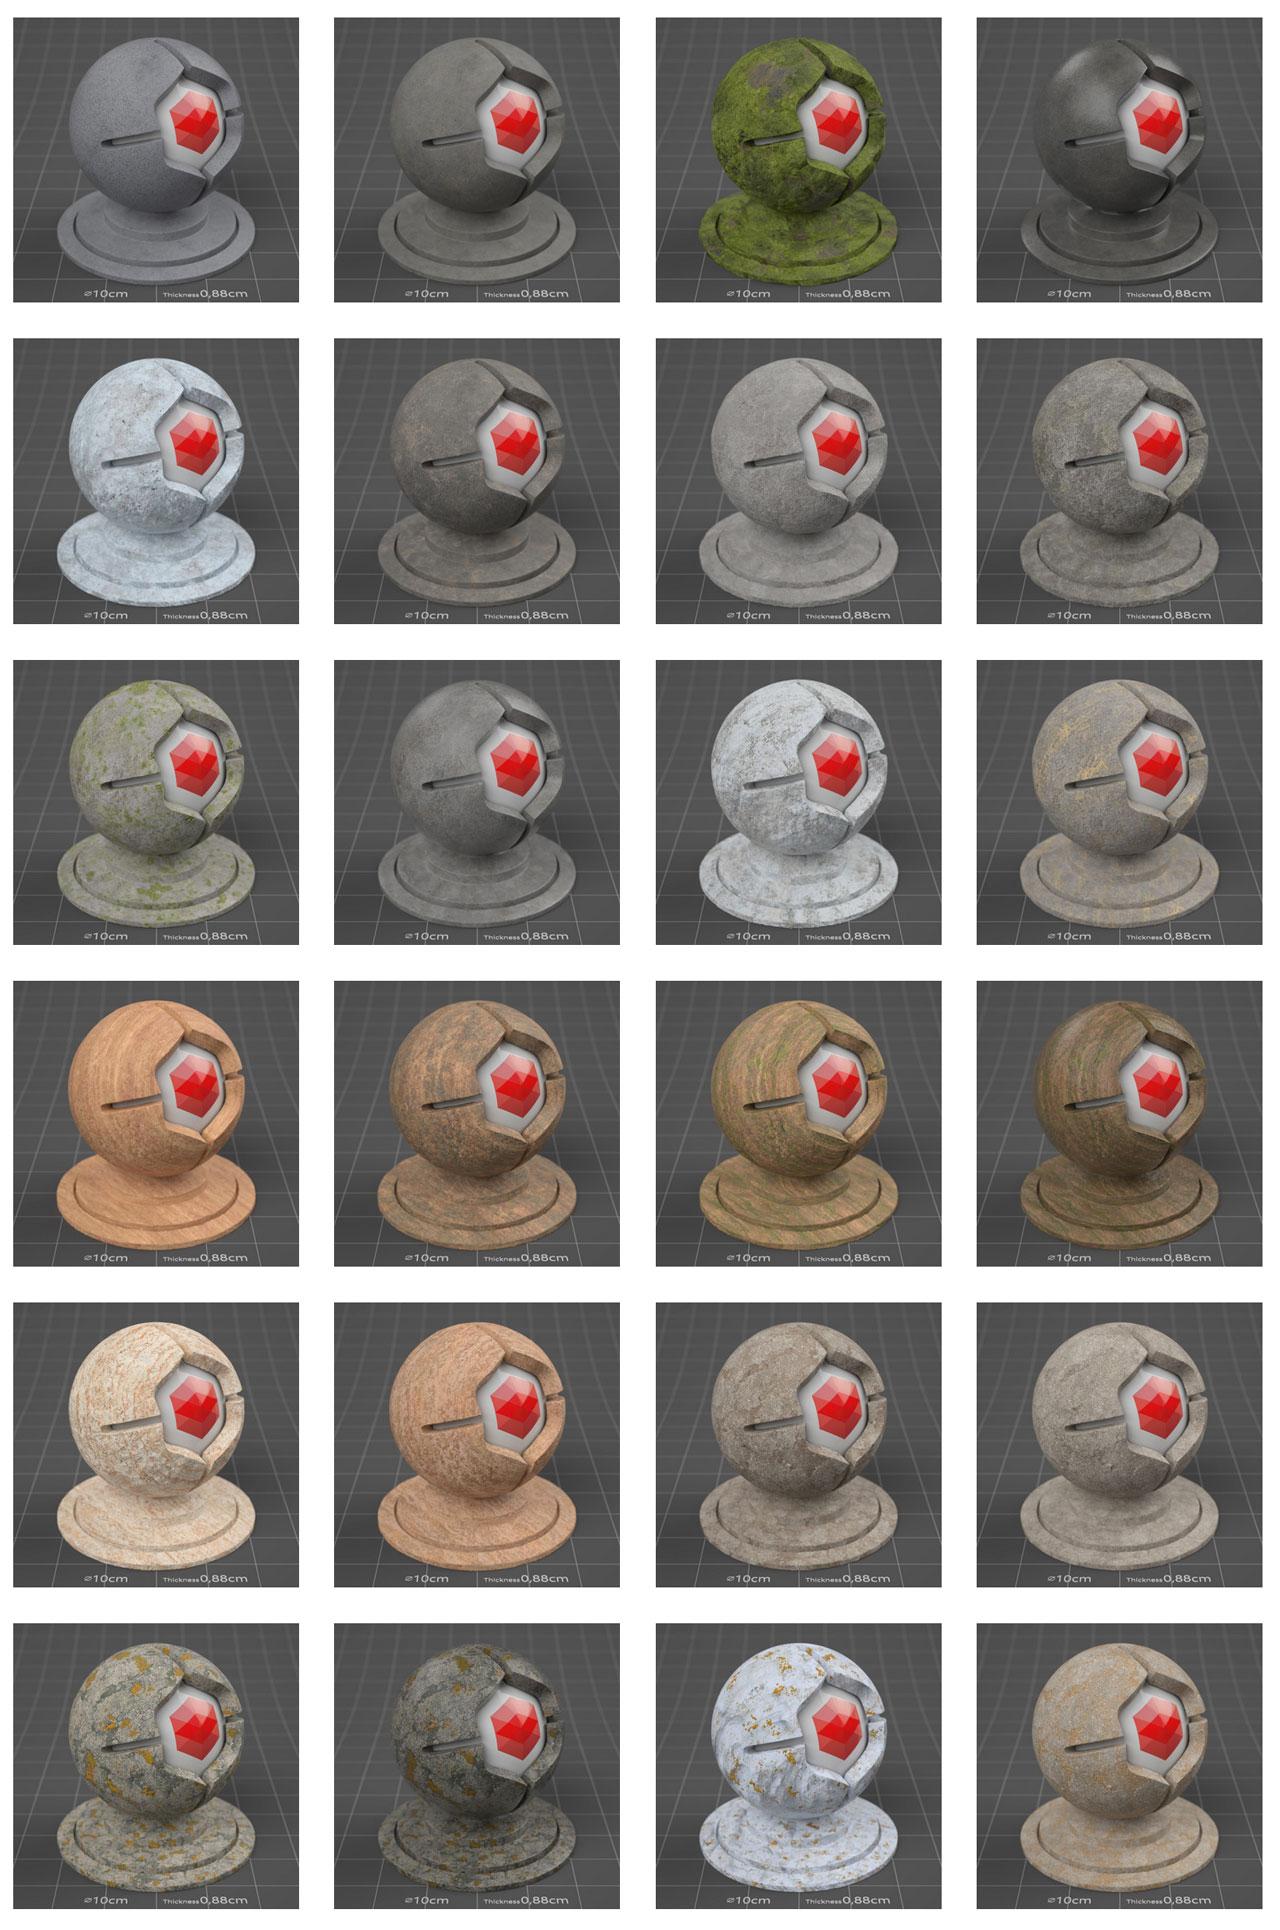 pixel lab redshift mutating stones rock sandstone